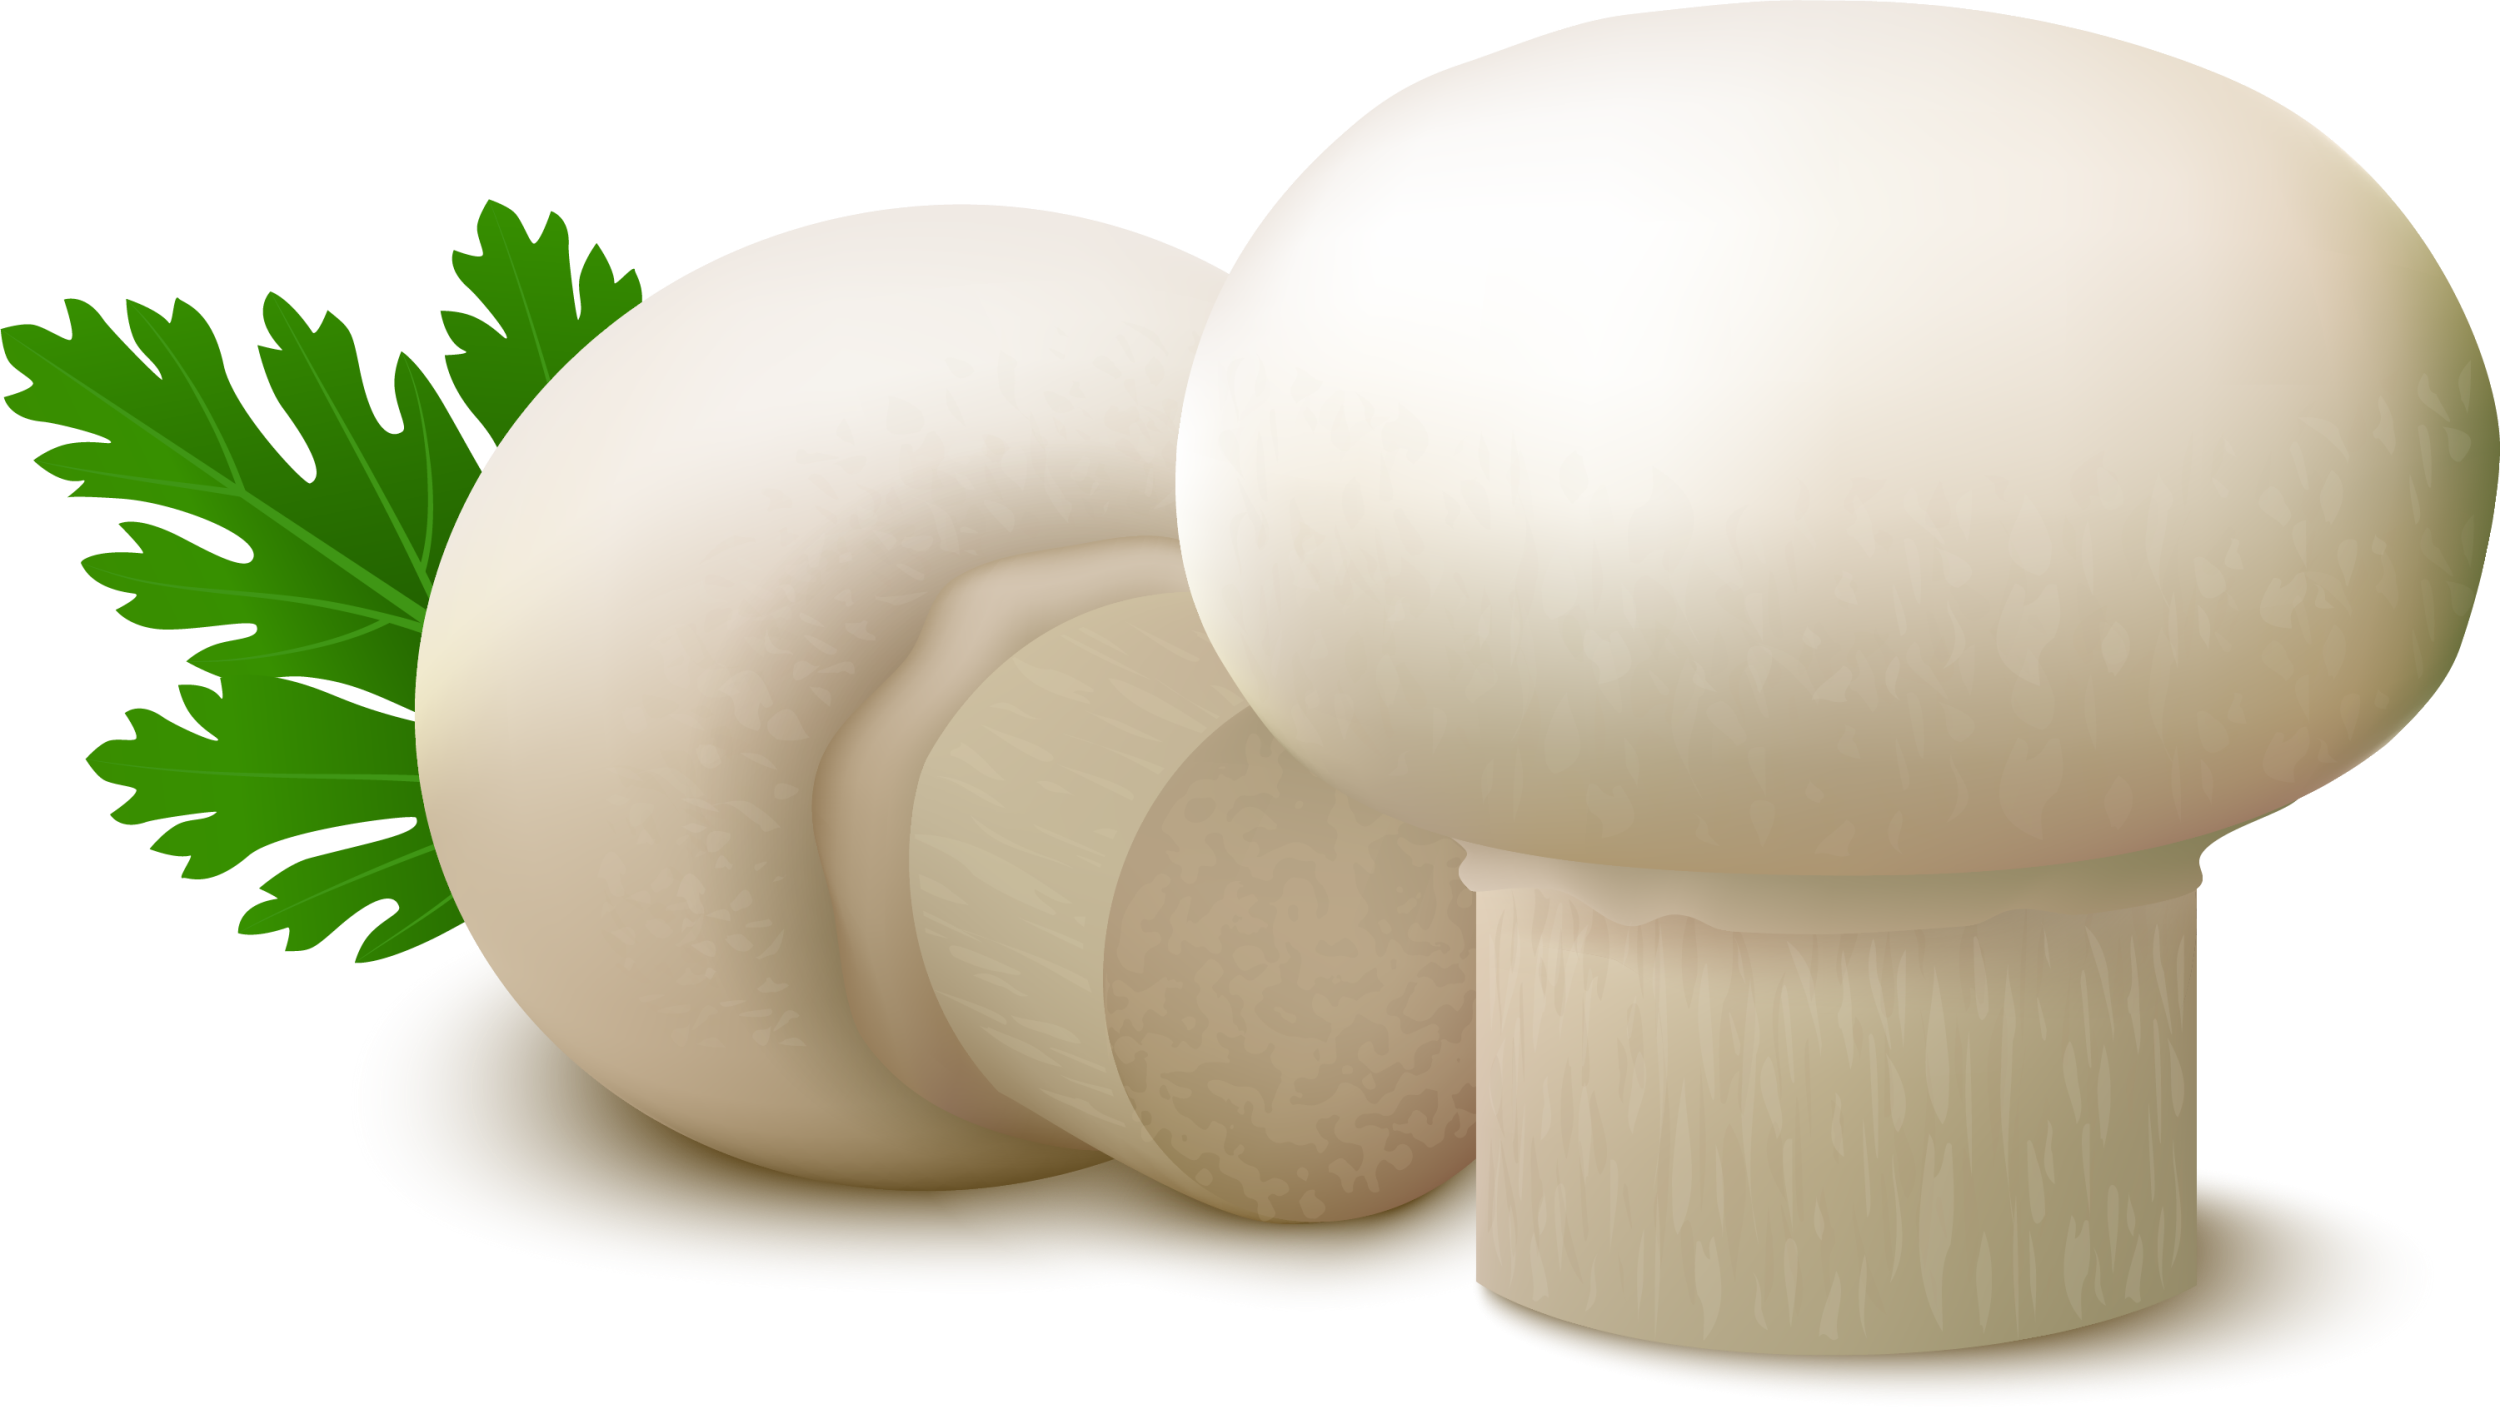 Clipart grass mushroom. Common food fungus white